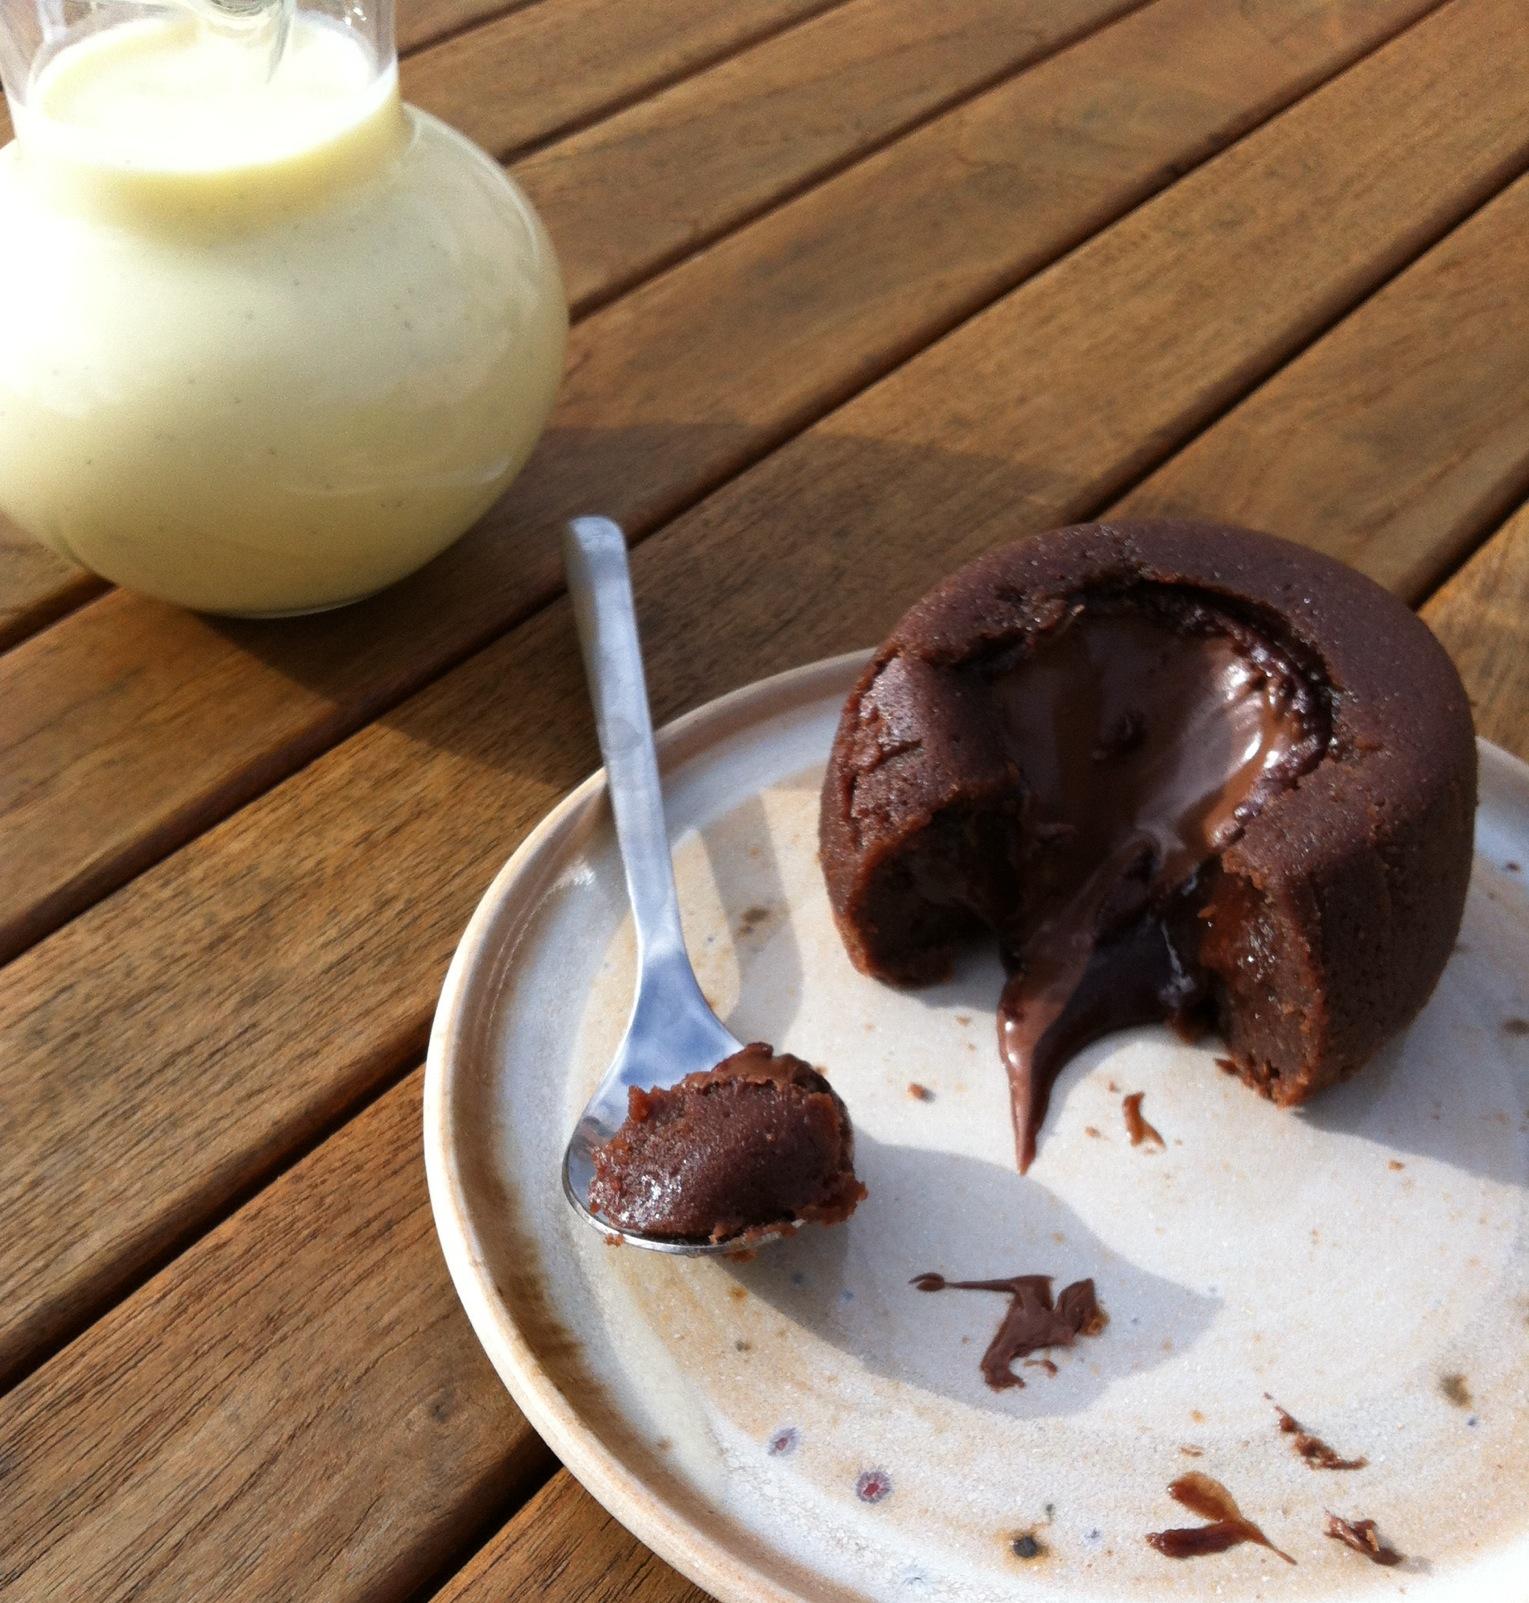 Gateau coeur fondant nutella arts culinaires magiques - Gateau au nutella fondant ...